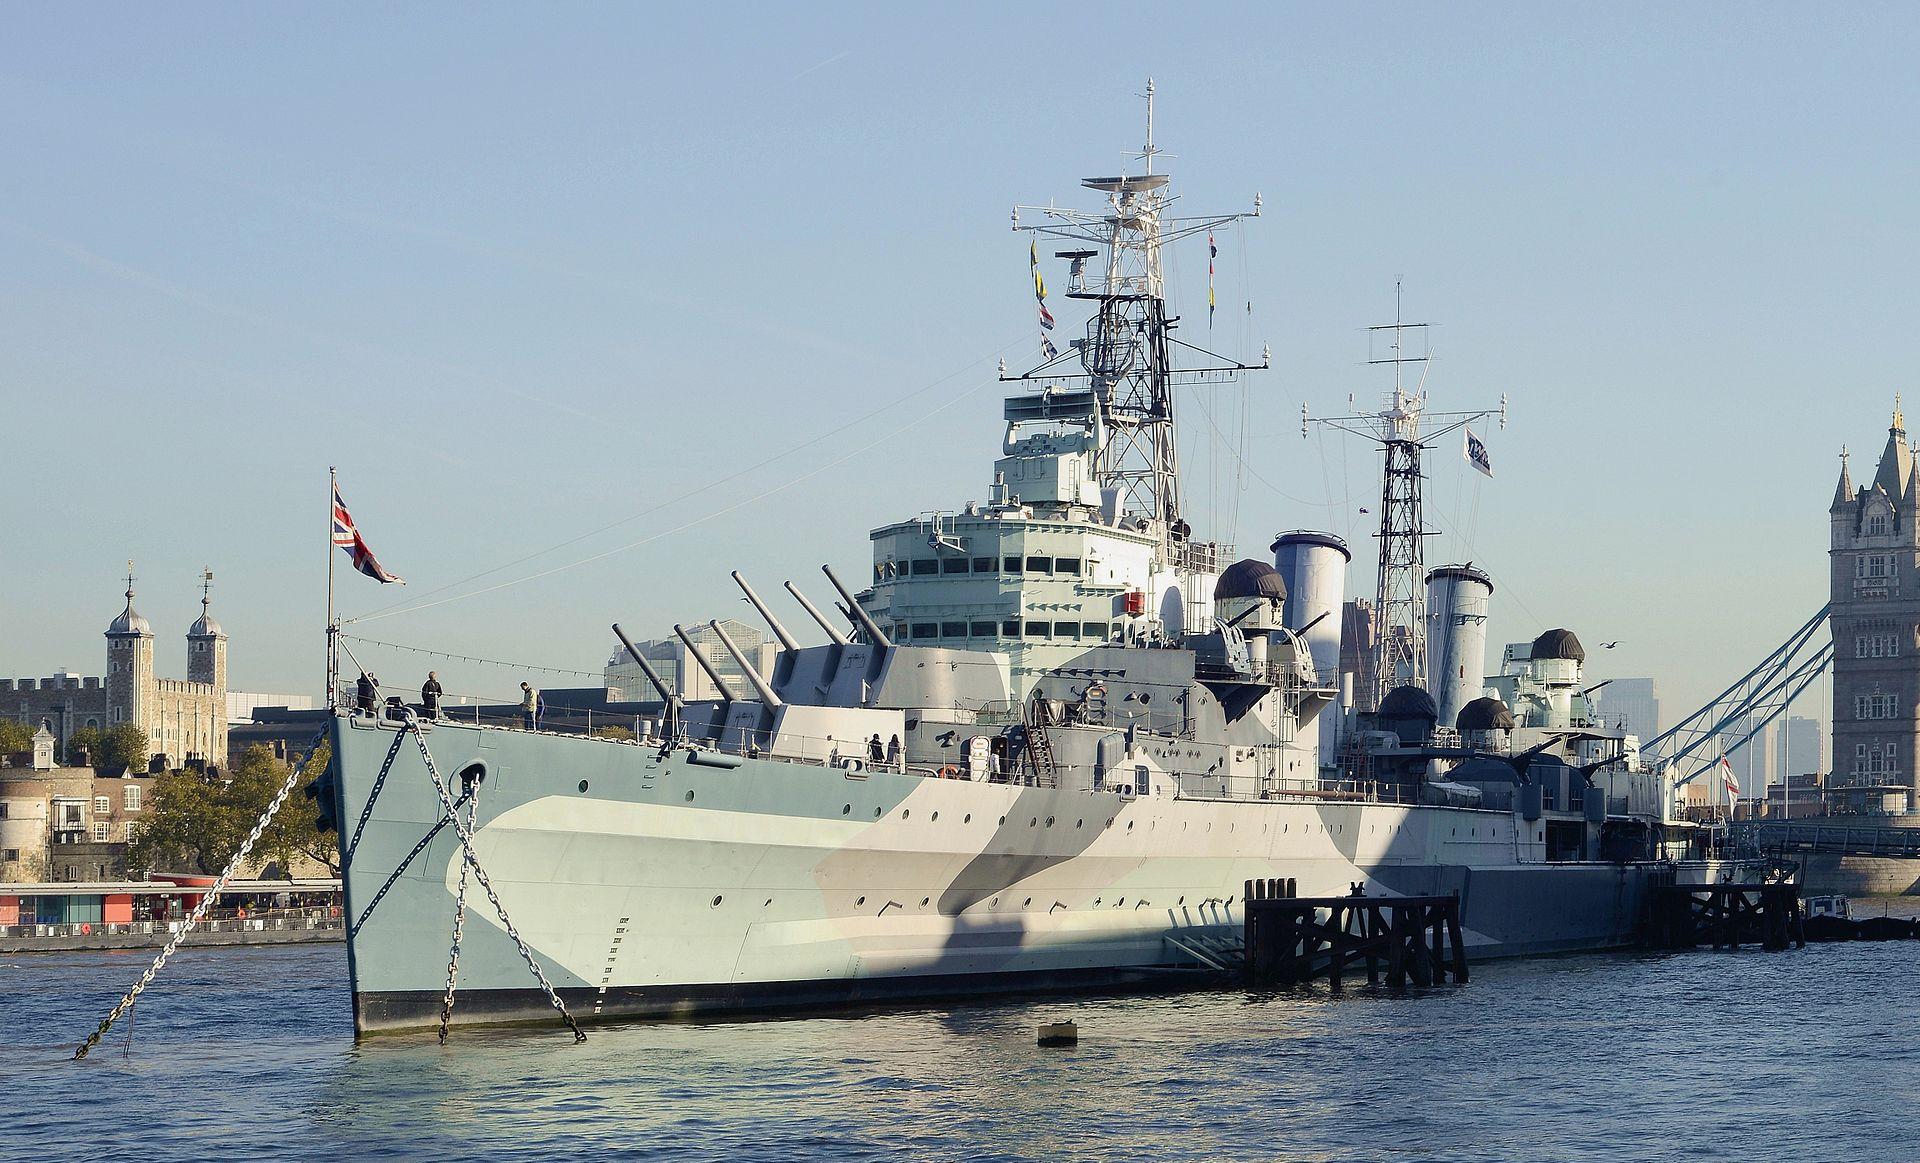 HMS Belfast | Credit: Alvesgaspar - Own work